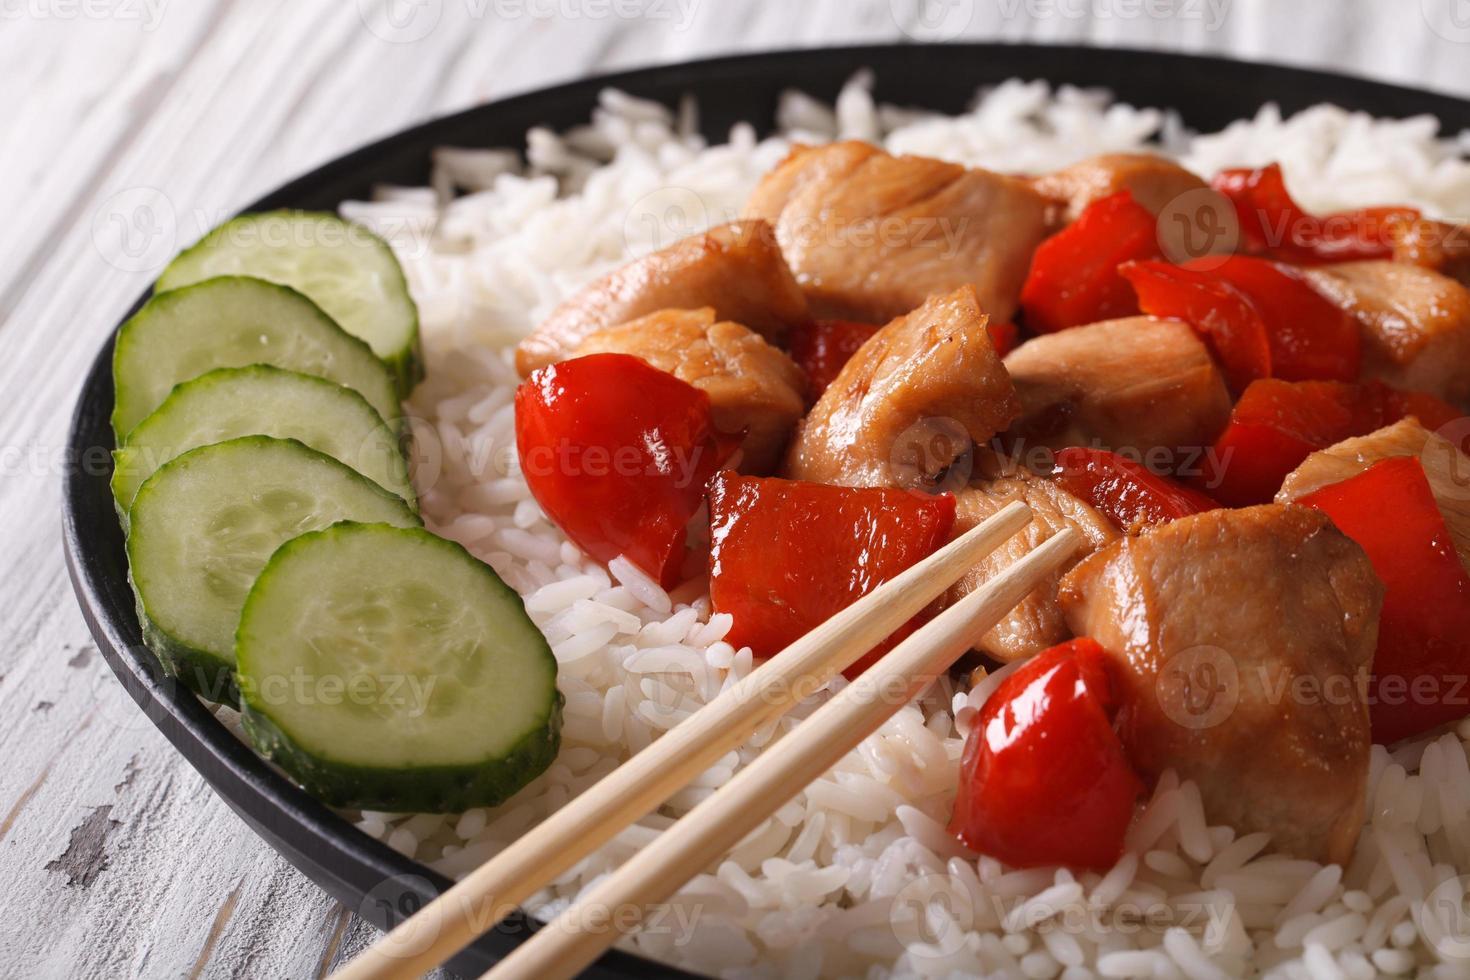 riz avec poulet et légumes en gros plan. horizontal photo